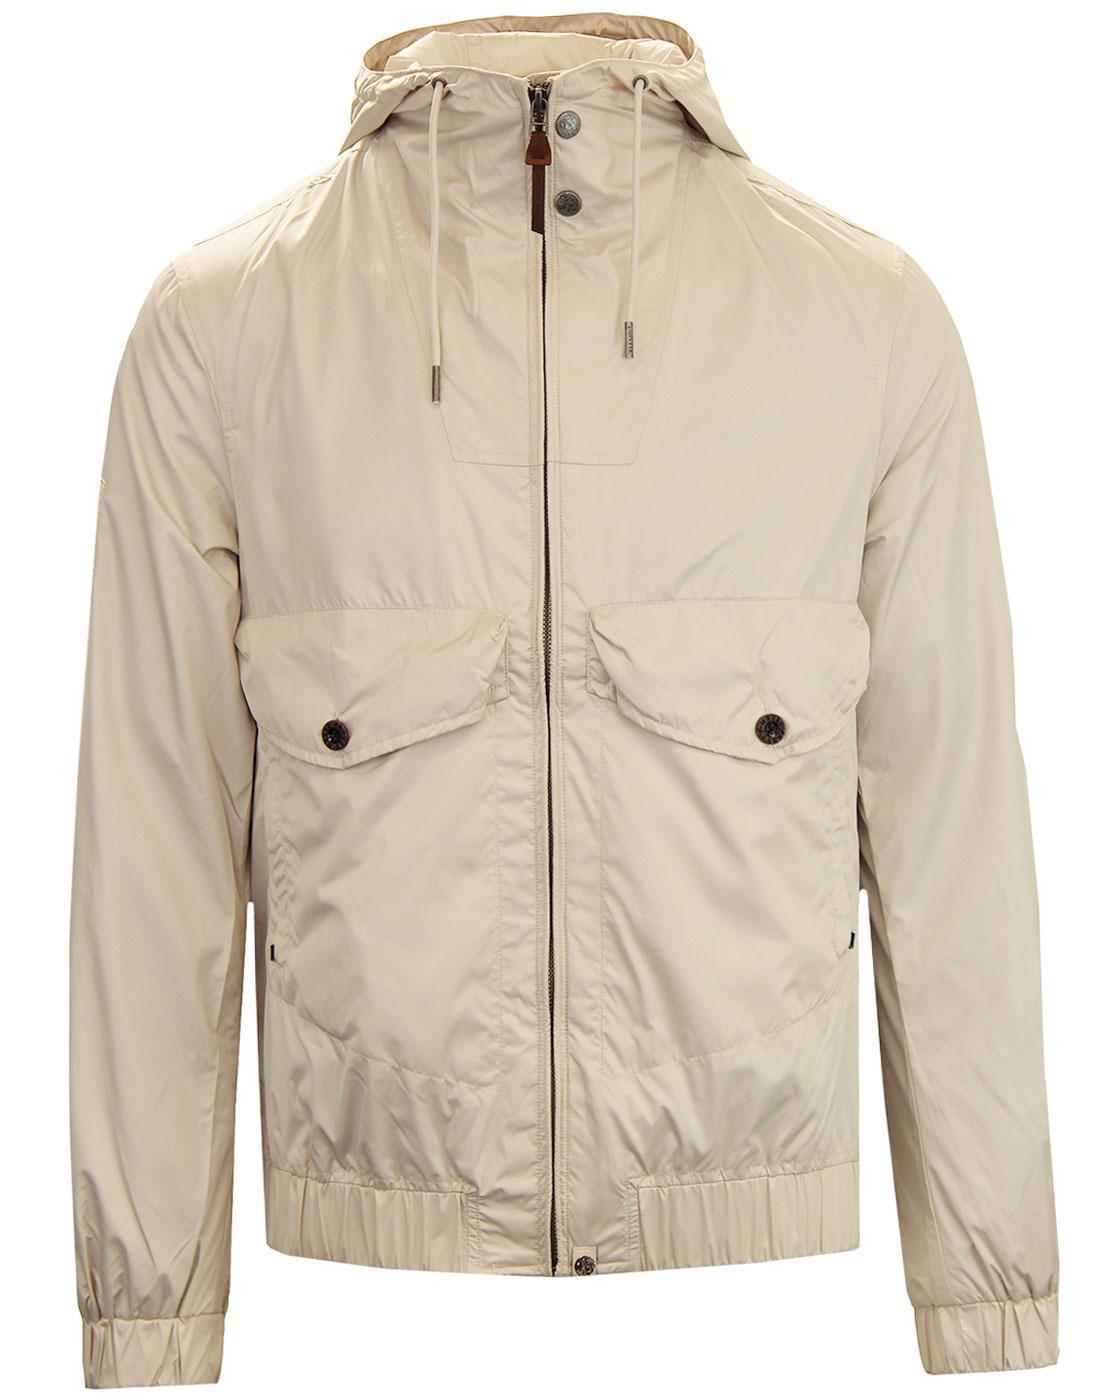 Cardwell PRETTY GREEN Retro Hooded Jacket STONE